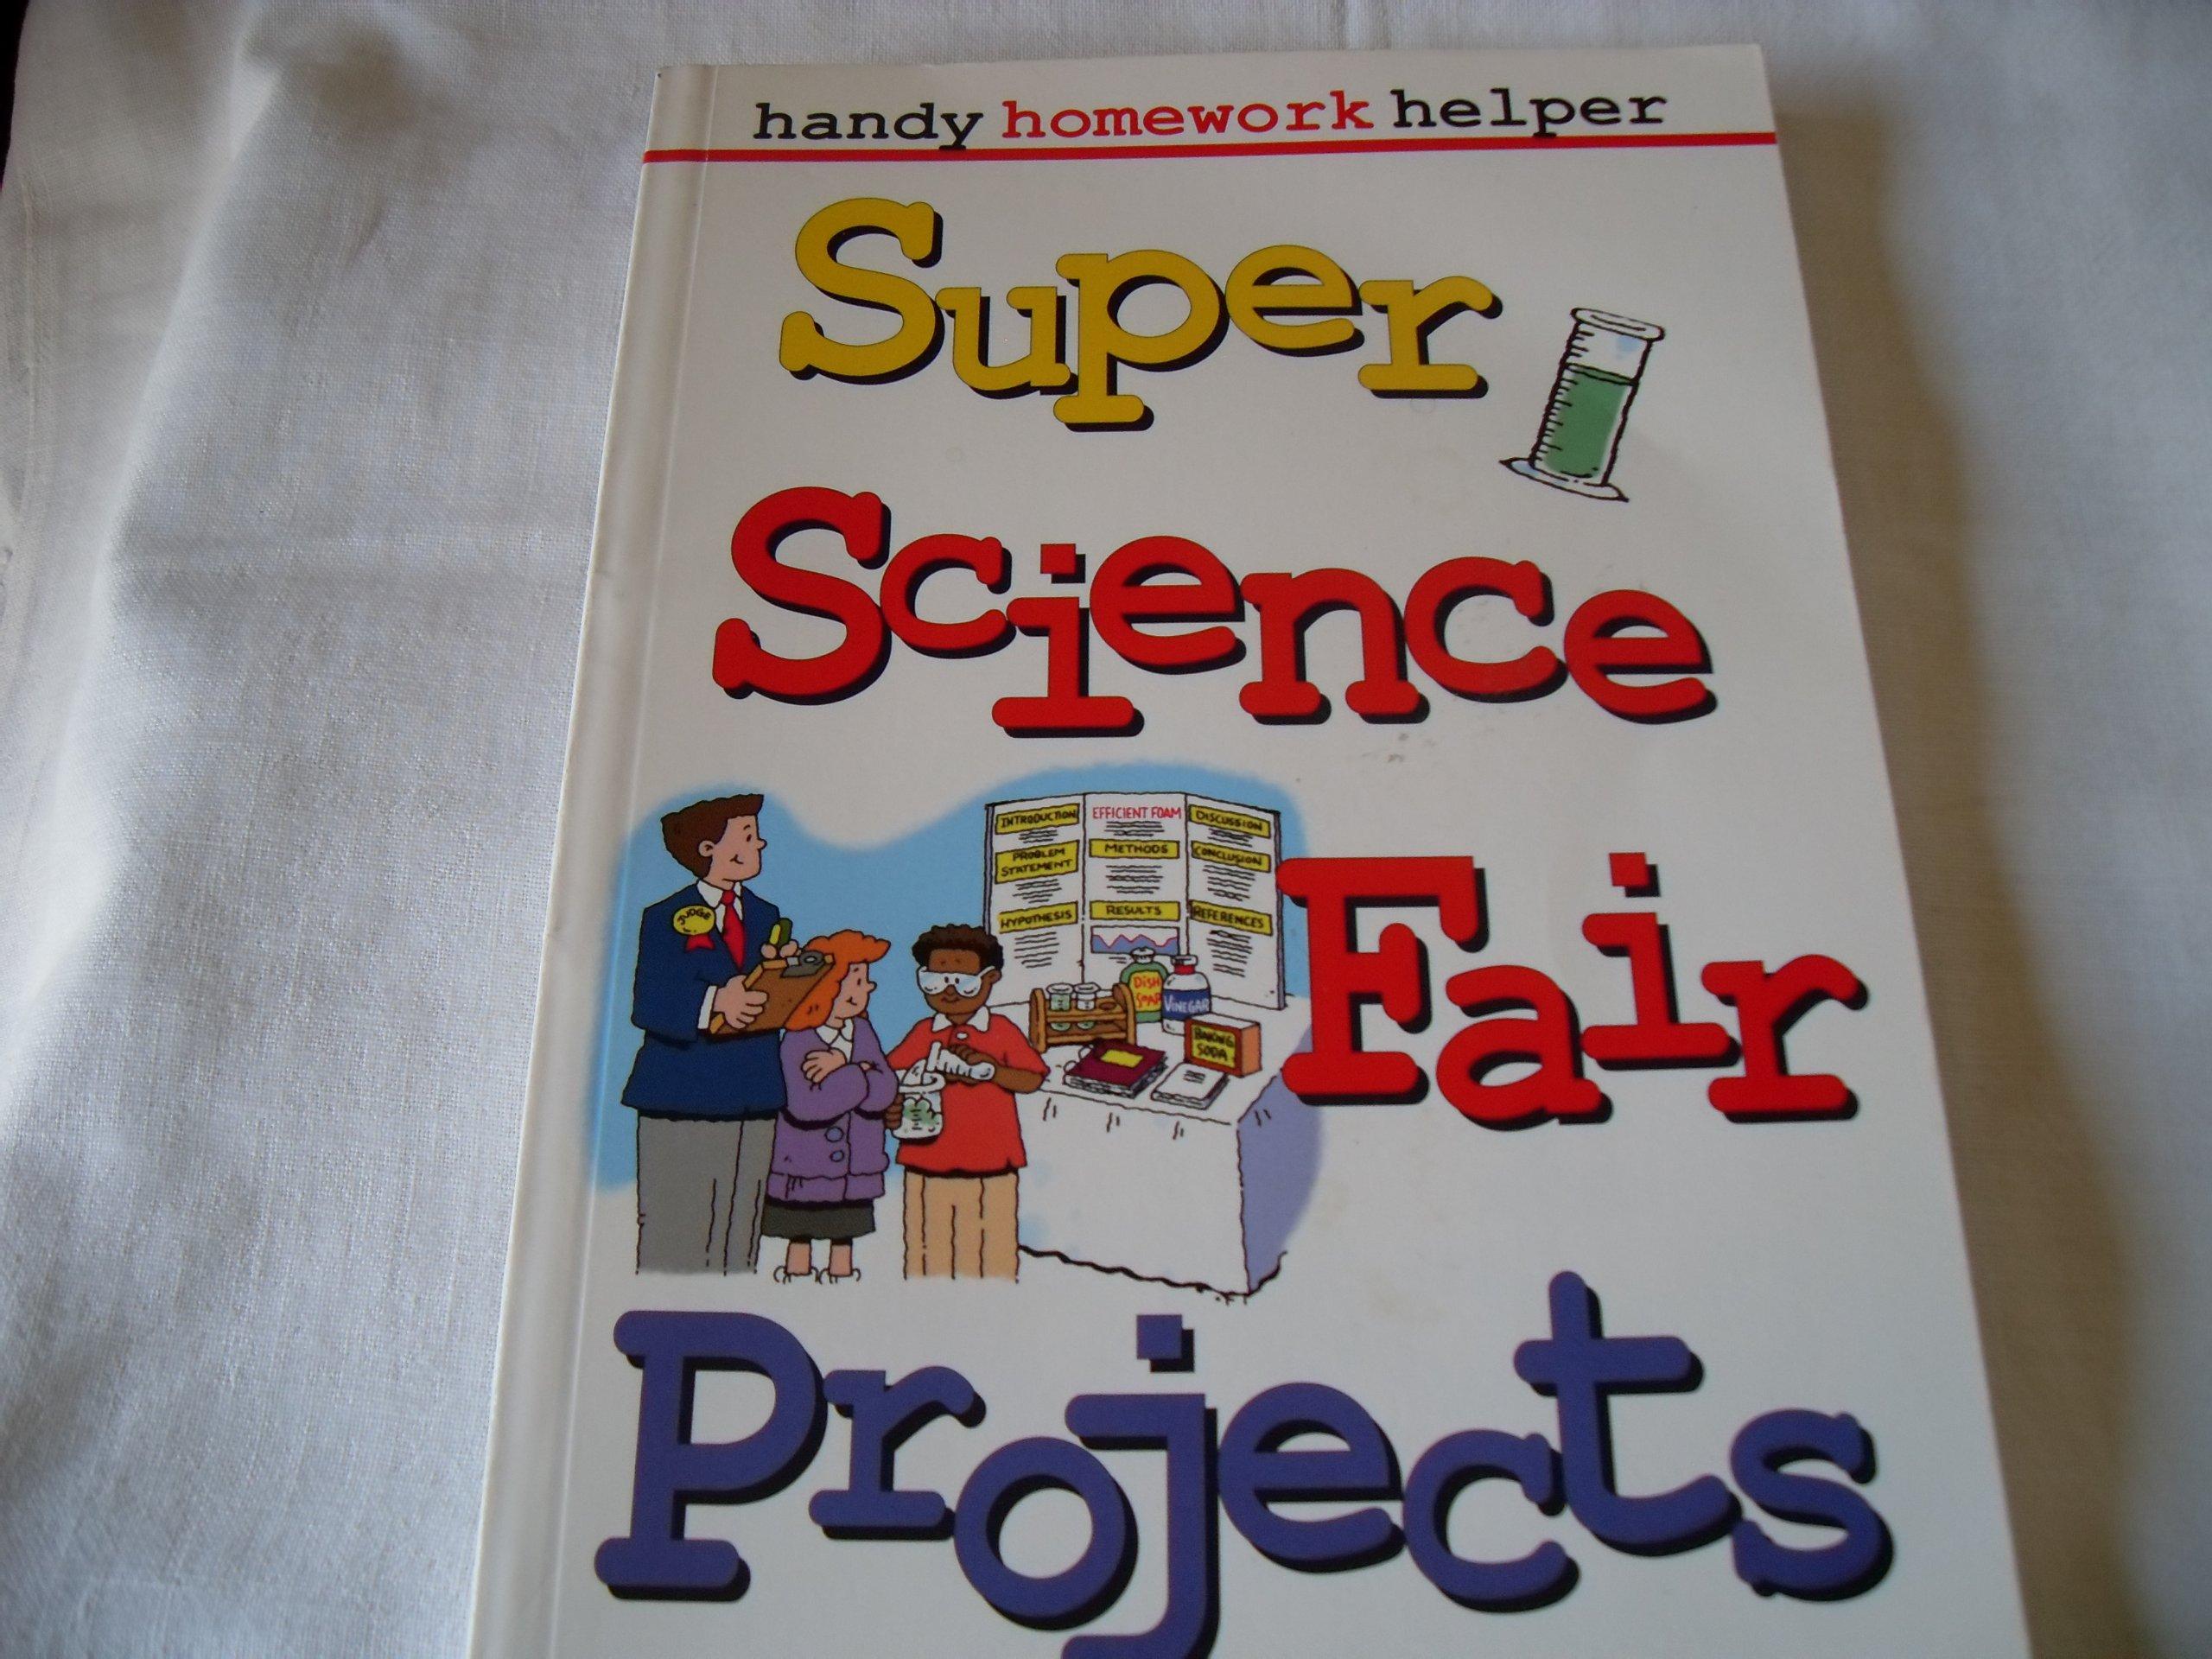 Mechanical Engineering Homework Help my Hhelpassignment ASCD